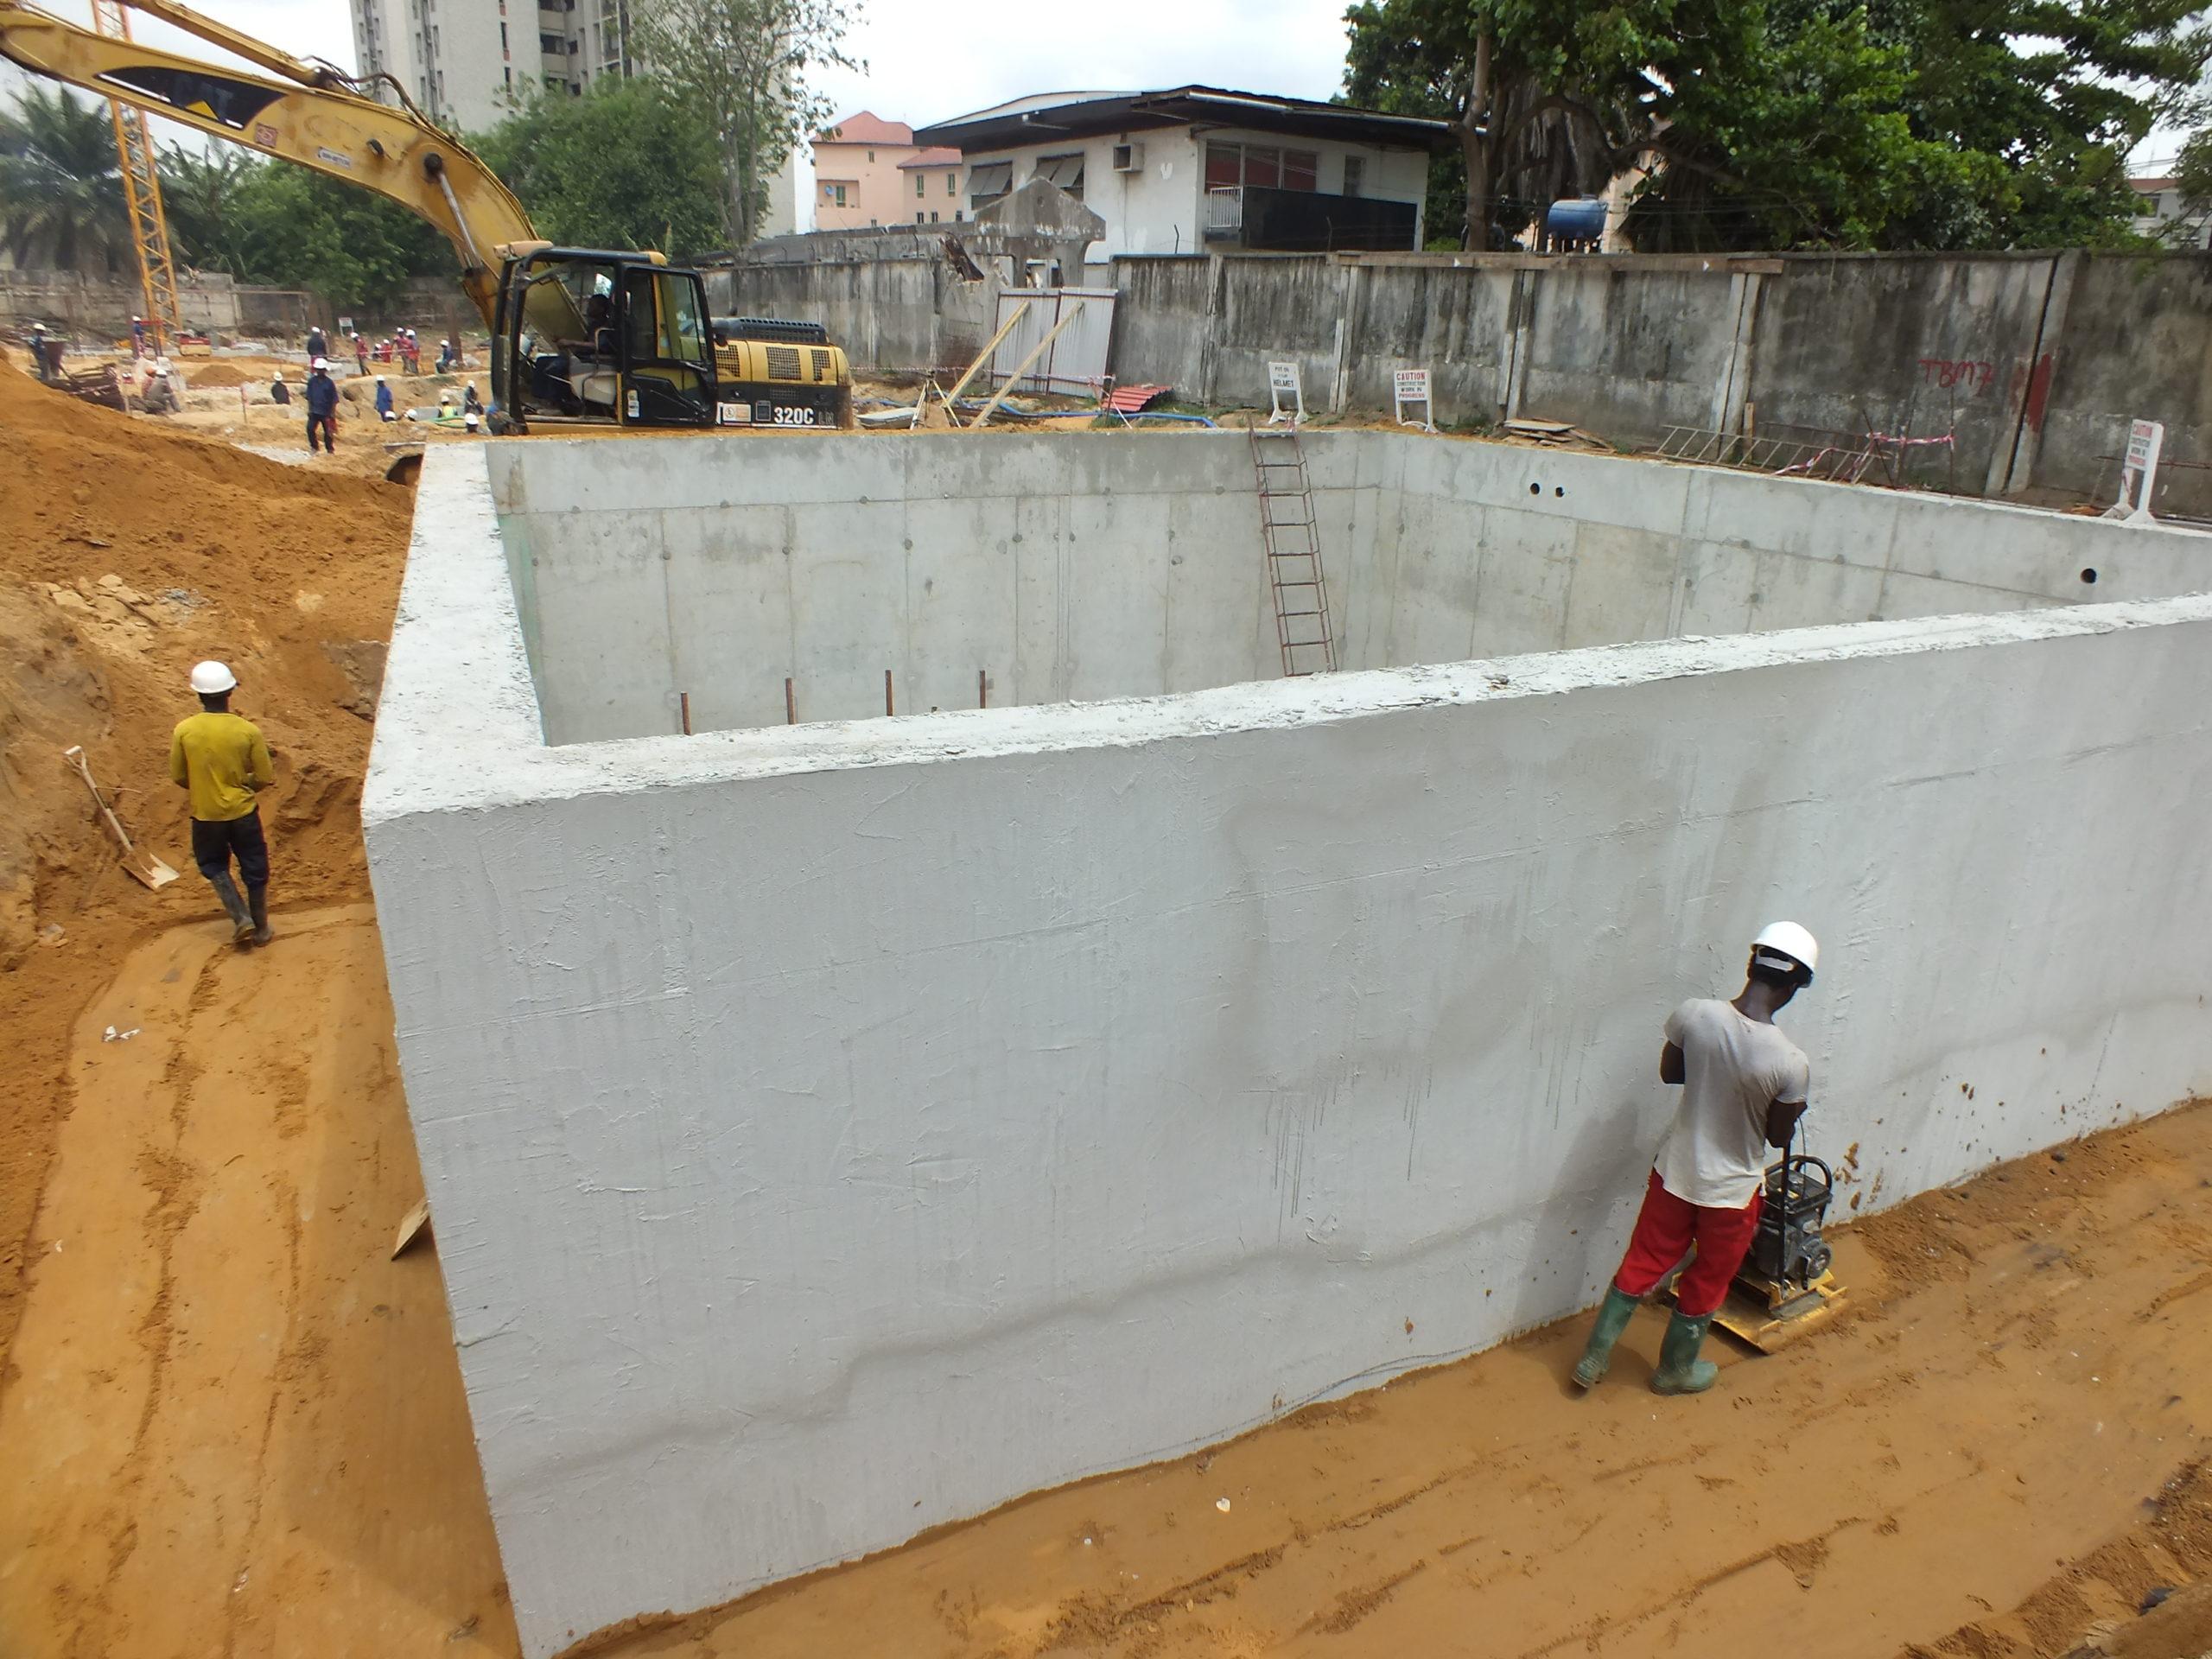 Application of AQUAFIN 1K on underground tanks backfilling work in progress after application